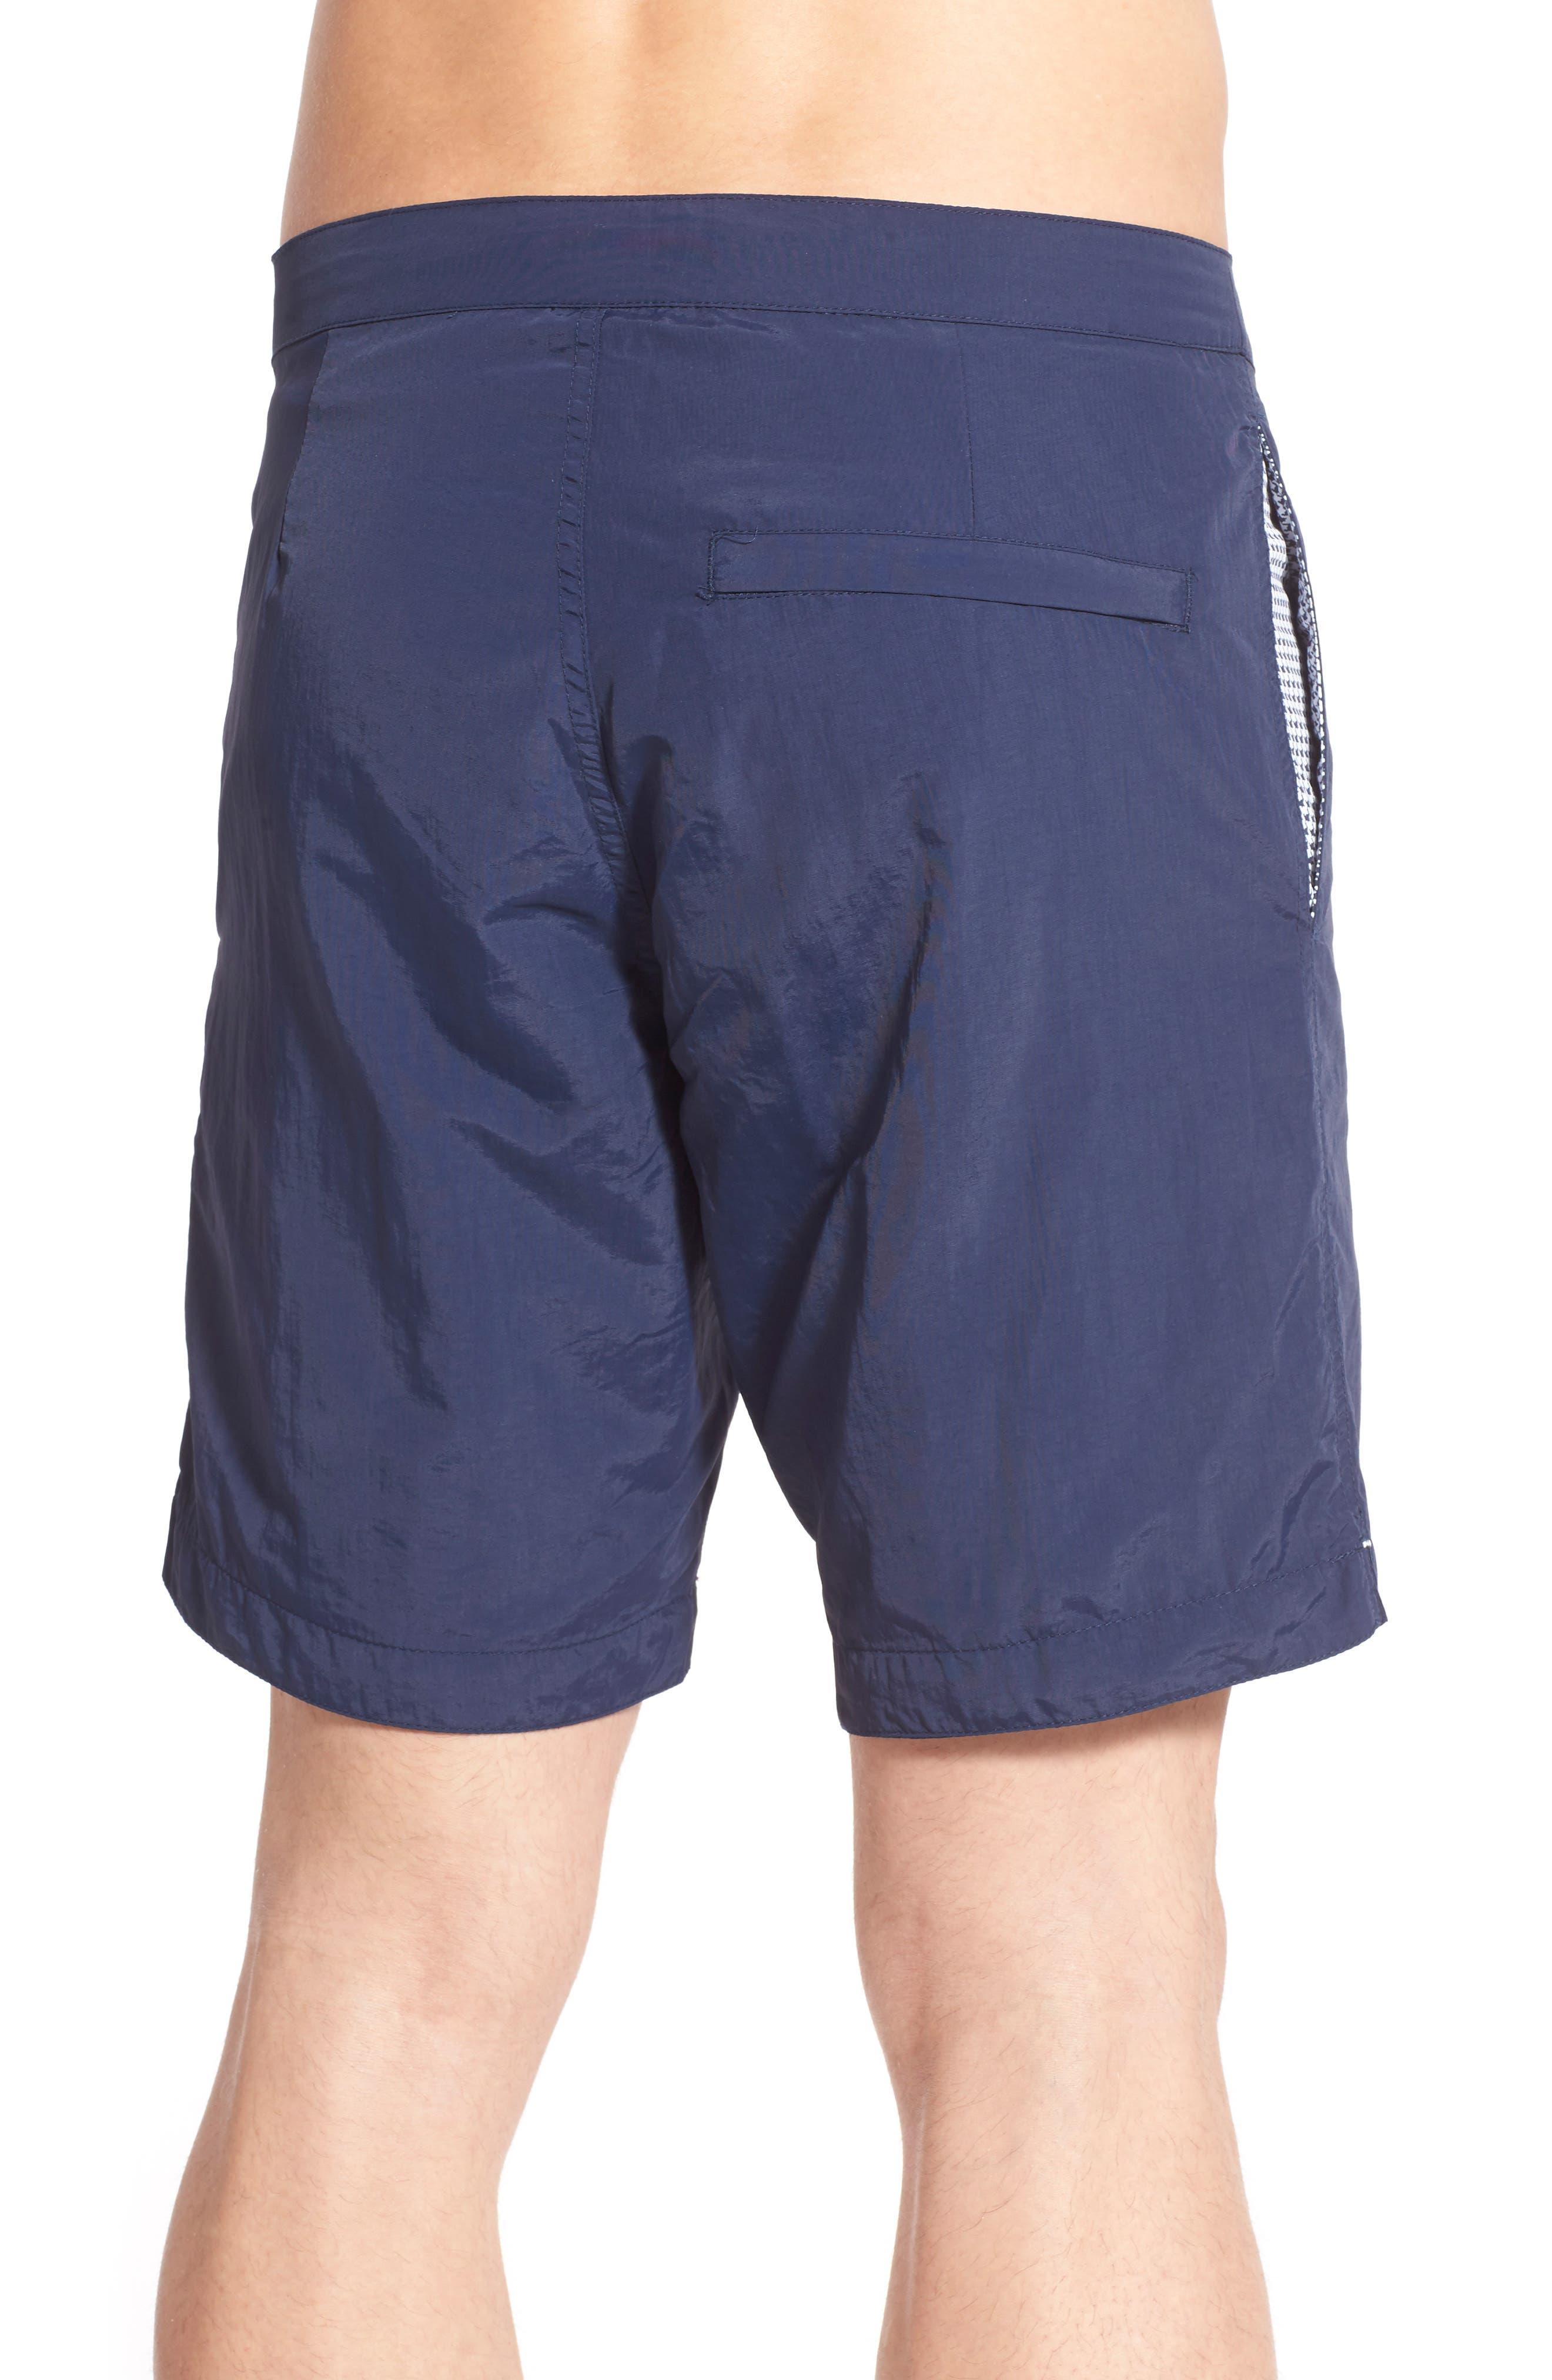 Aruba Tailored Fit 8.5 Inch Swim Trunks,                             Alternate thumbnail 3, color,                             415